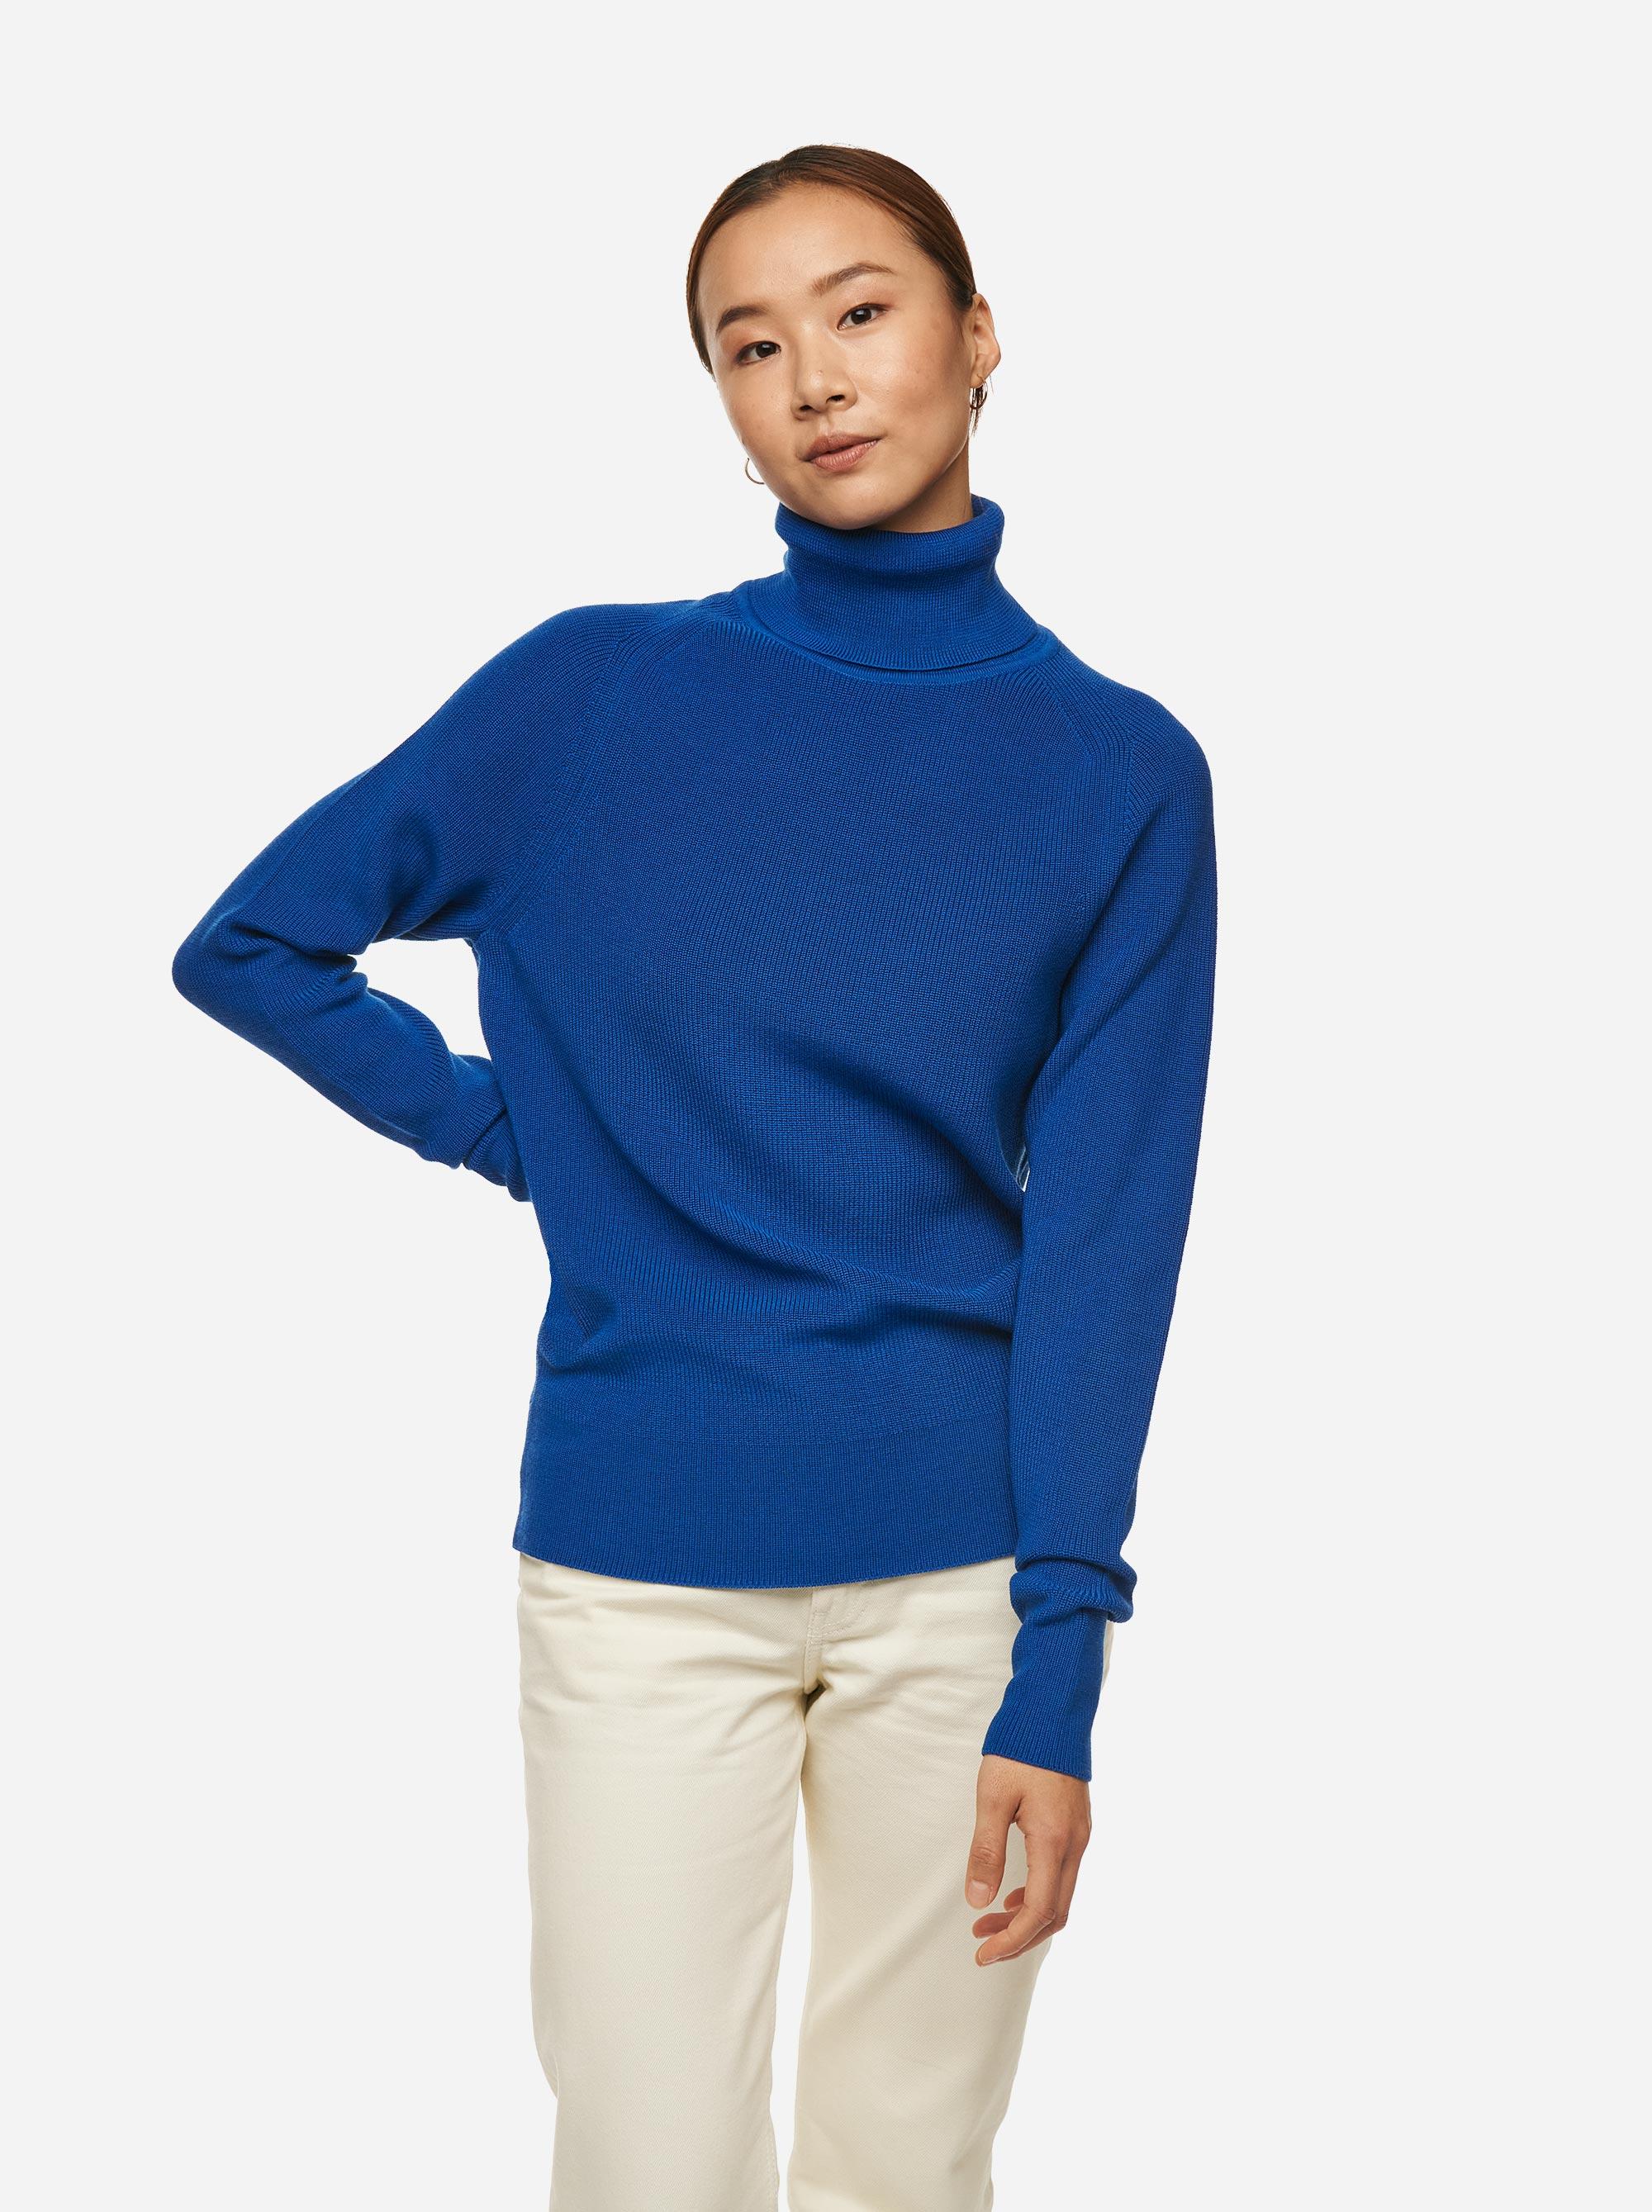 Teym - Turtleneck - The Merino Sweater - Women - Cobalt - 1